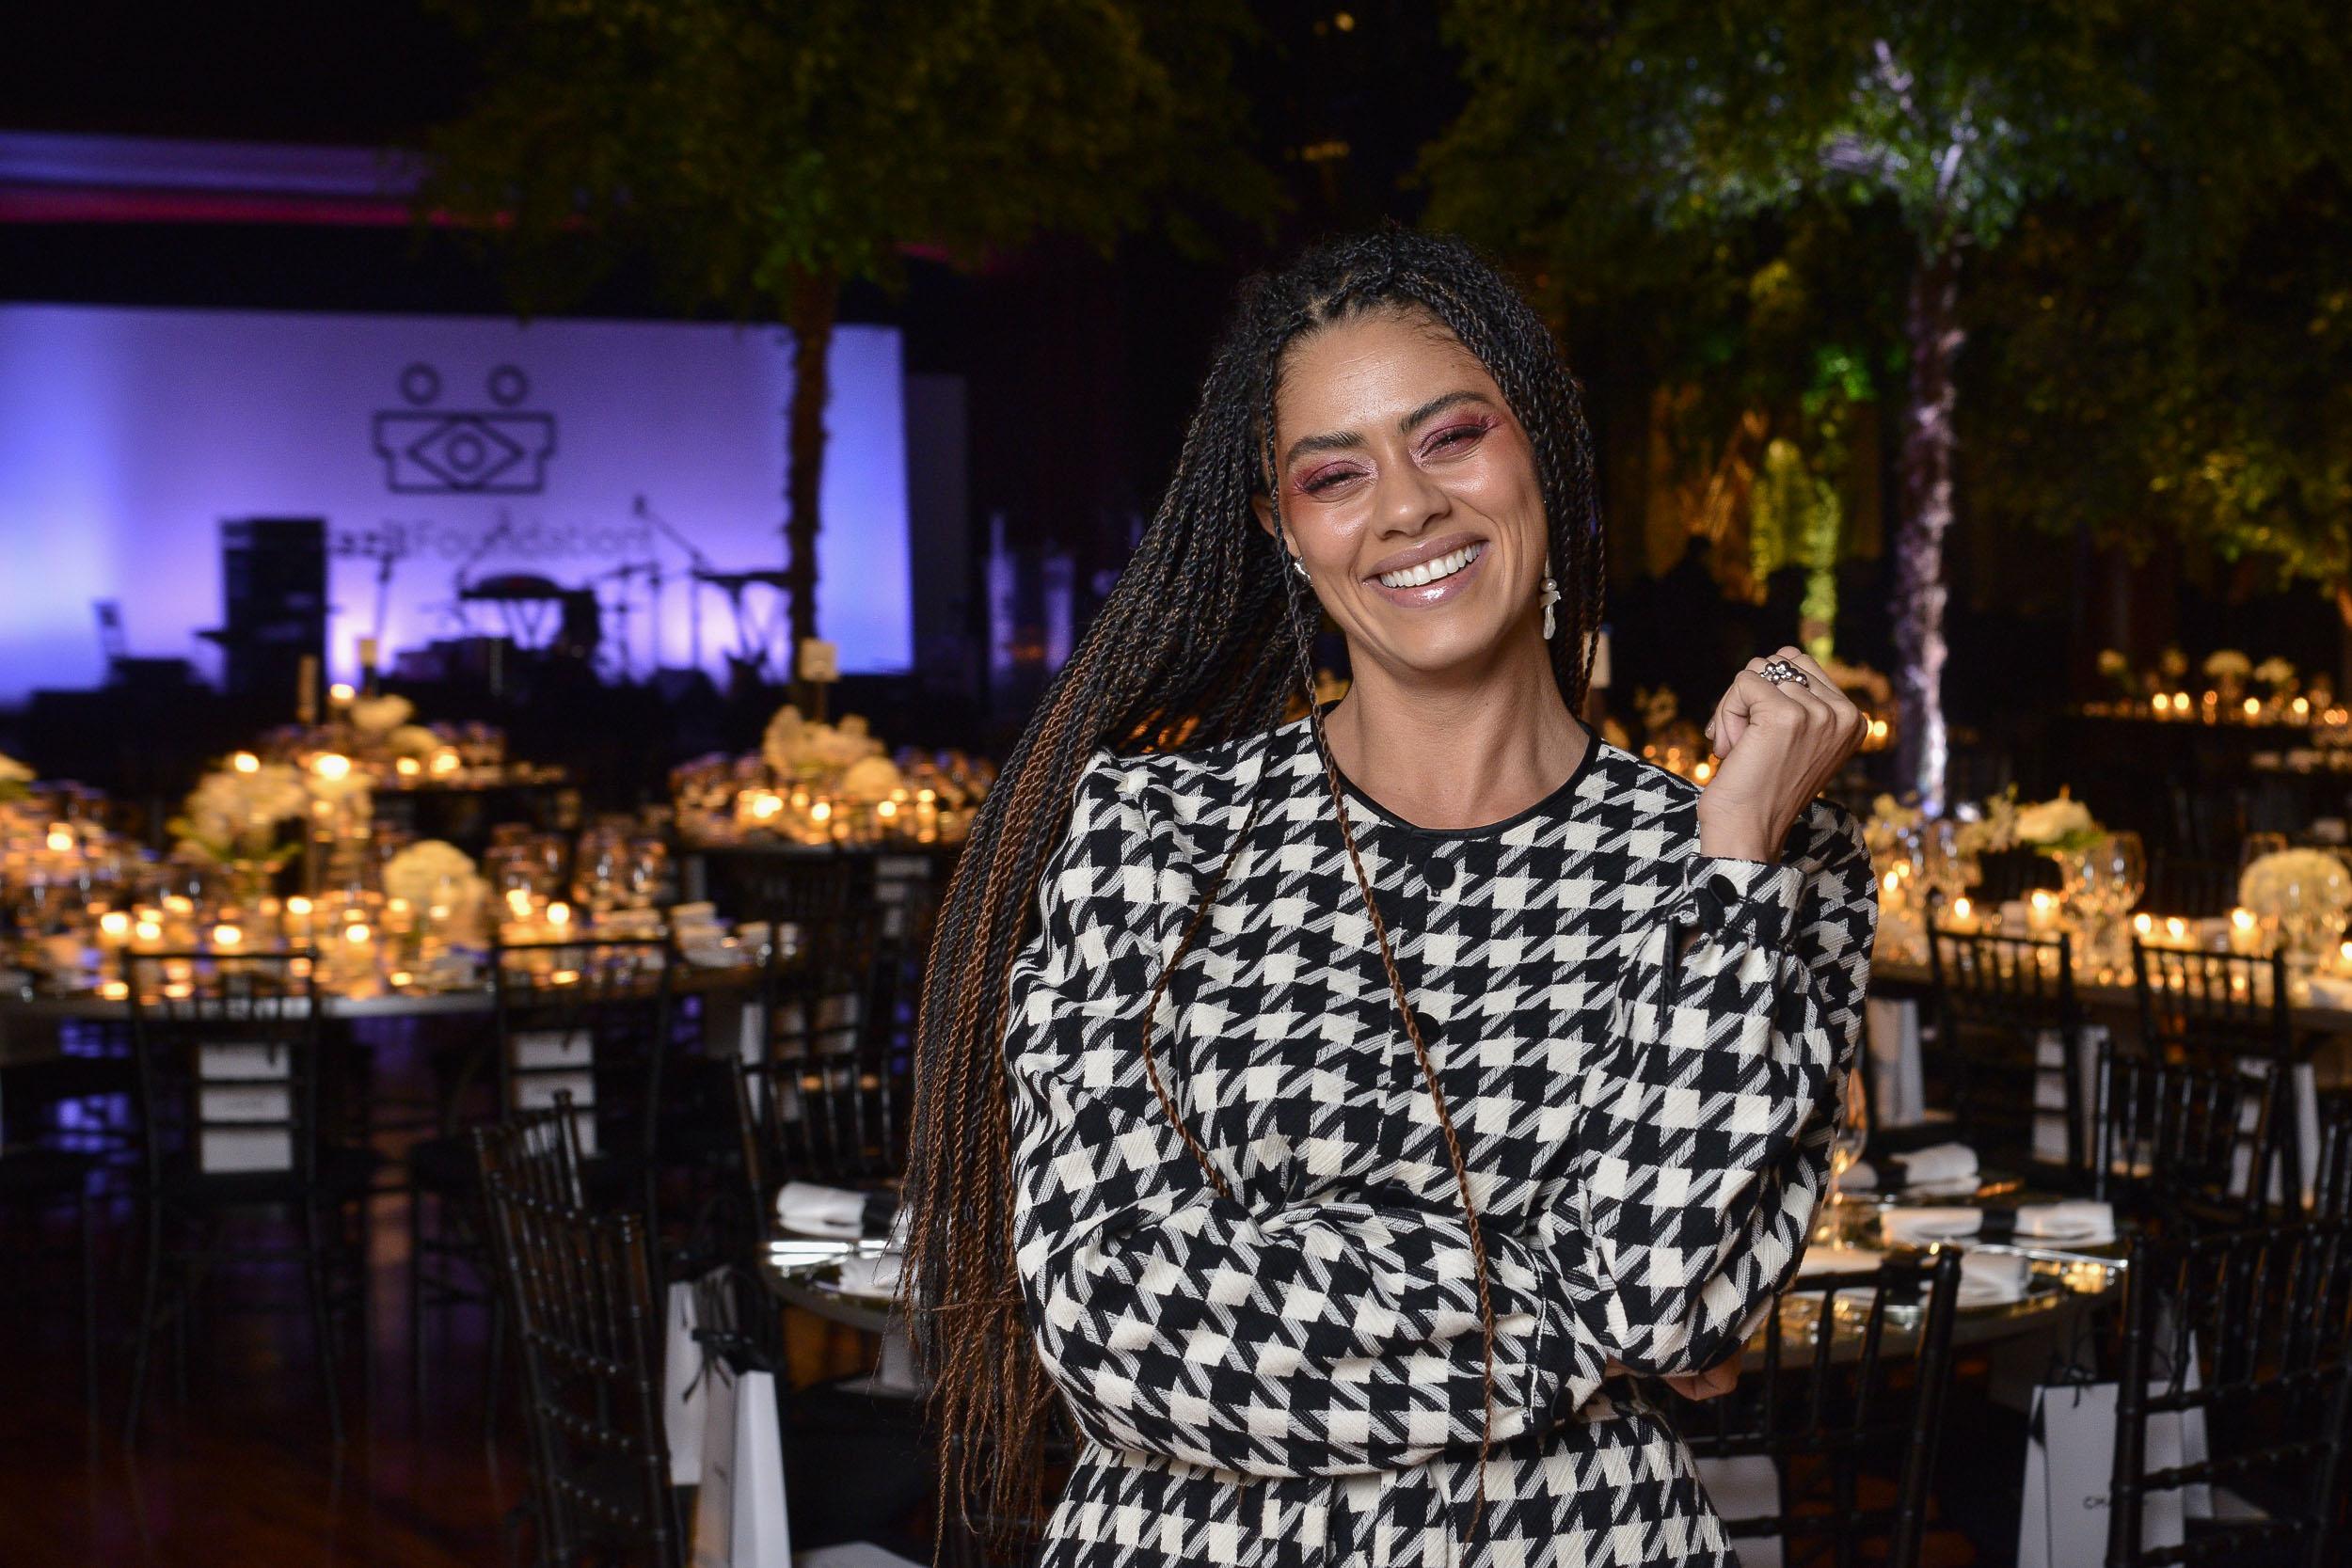 Ana Flavia Cavalcanti BrazilFoundation Gala São Paulo Mulheres Notáveis Women Philanthropy Filantropia